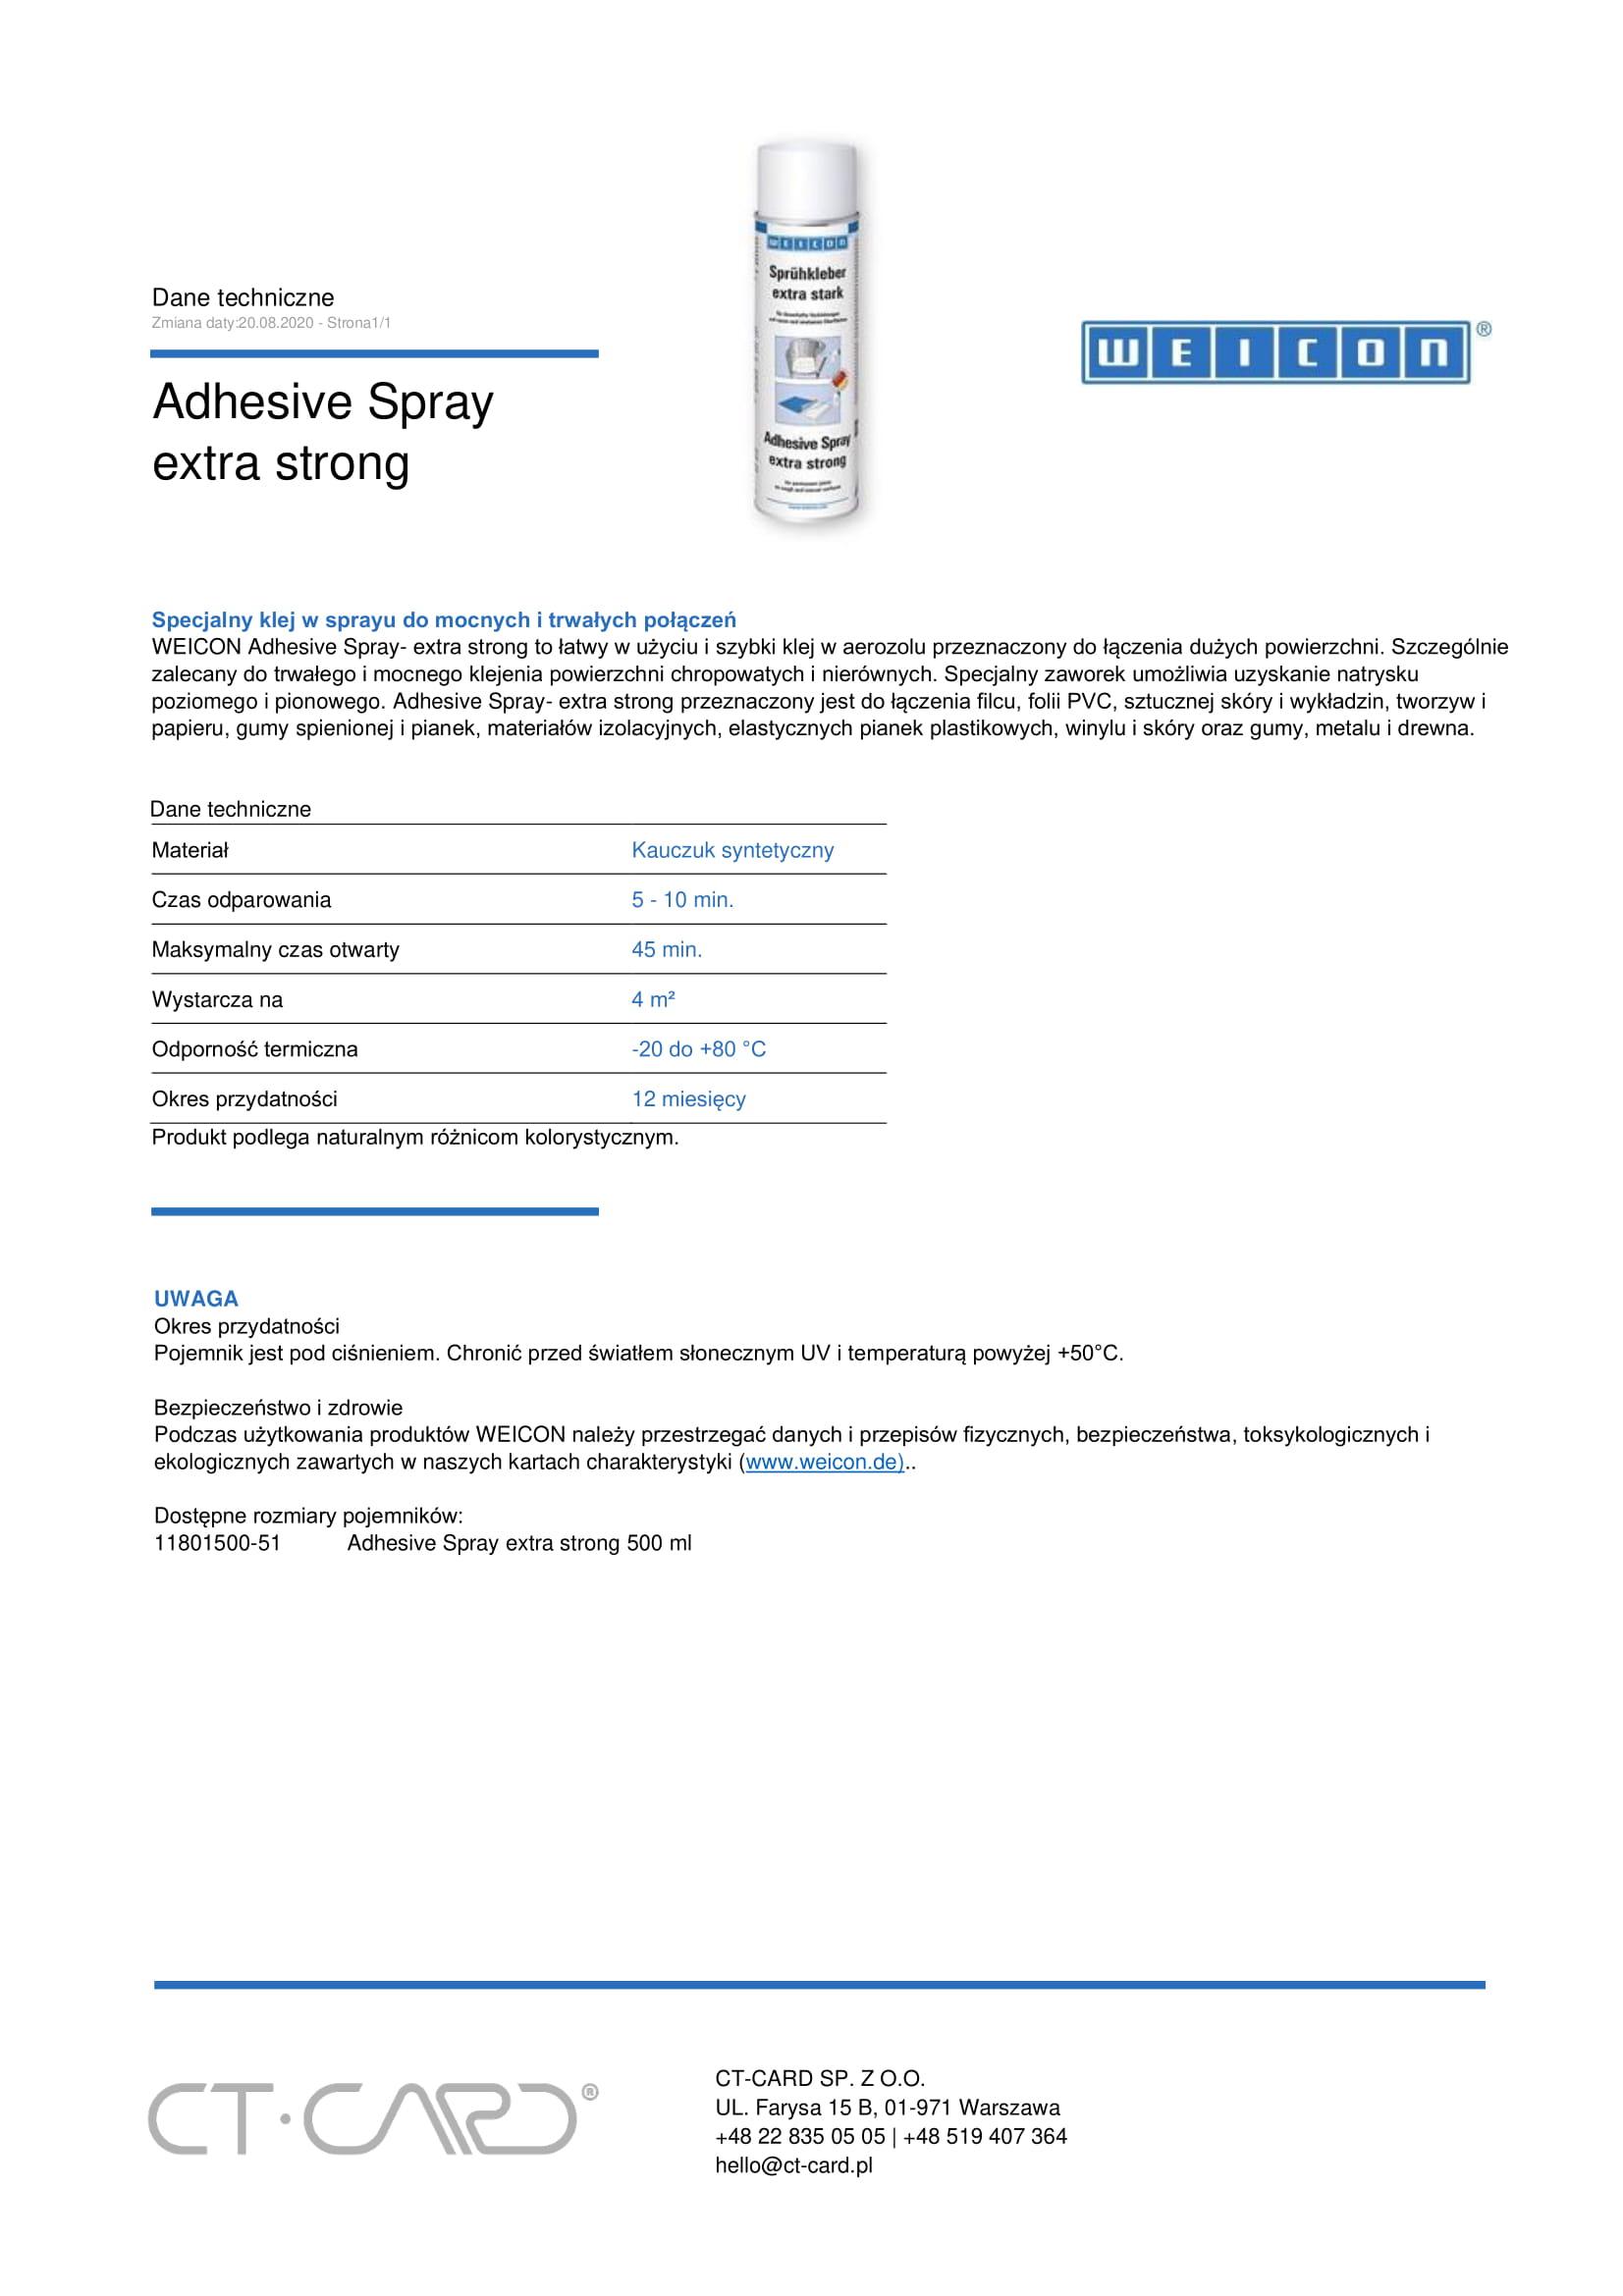 Adhesive Spray extra strong-1